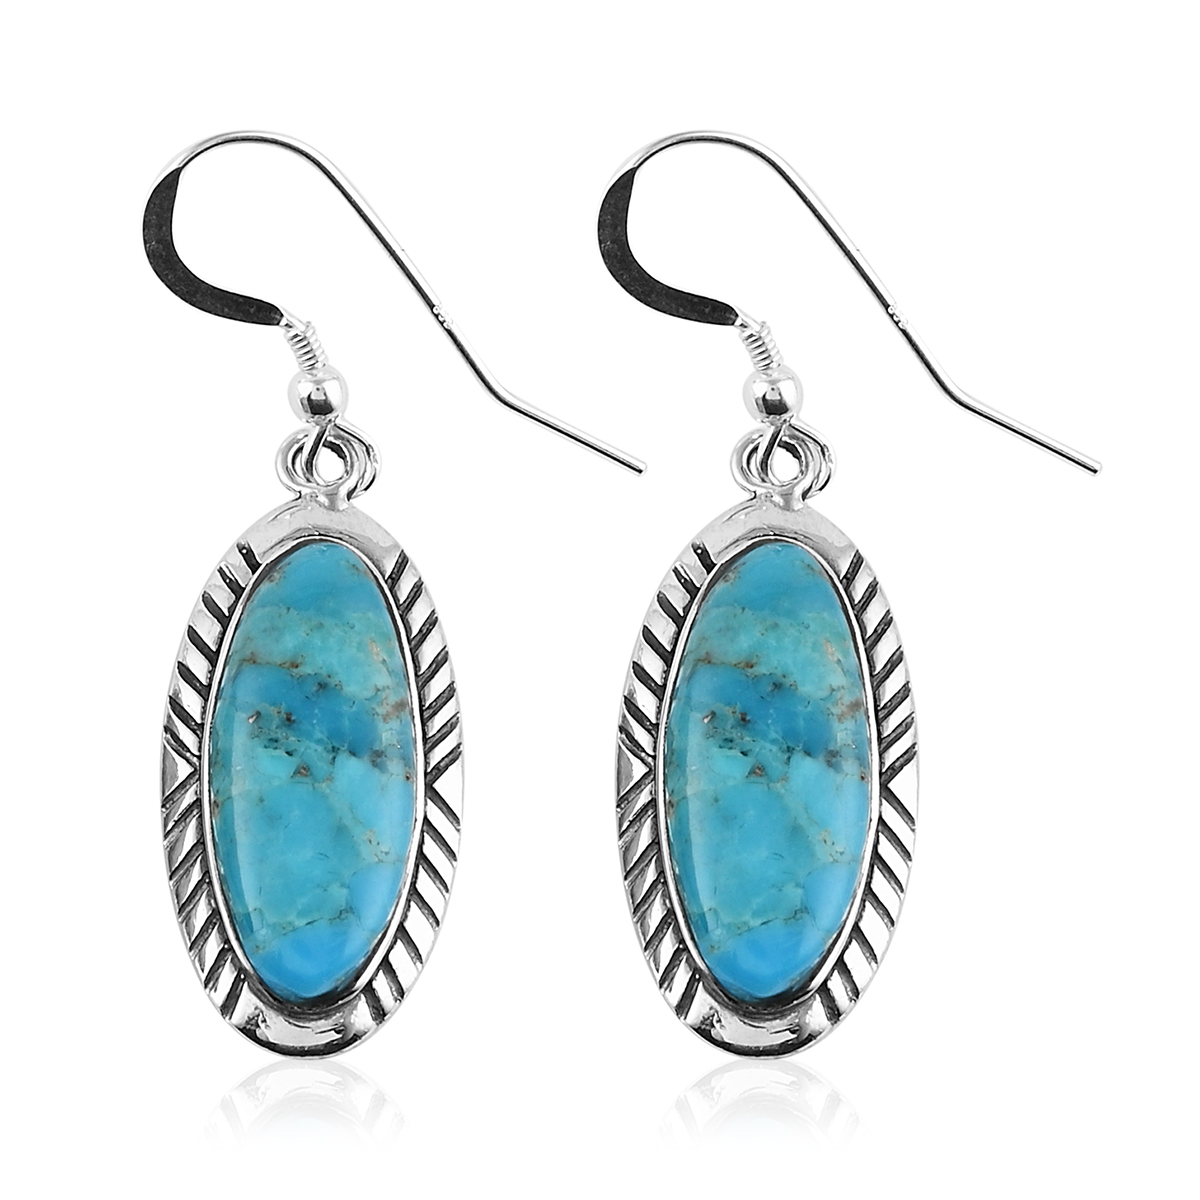 Santa Fe Style 925 Silver Turquoise Earrings Pendant ...